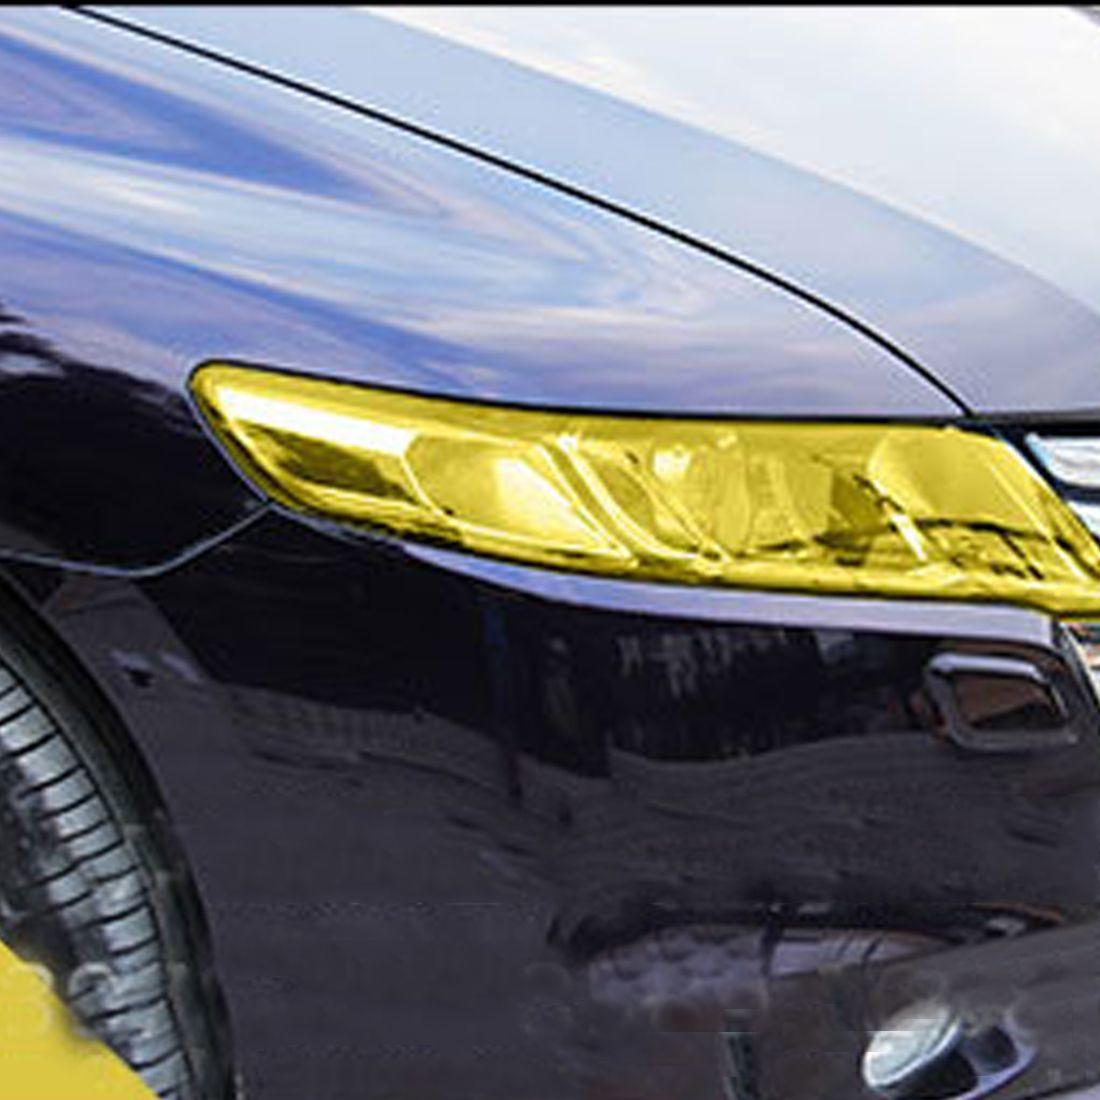 Hot Sale 120 30cm Auto Car Light Headlight Taillight Tint Vinyl Film Sticker Sheet Light Black Car Light Color Ch Mirror With Lights Exterior Accessories Tints [ jpg ]